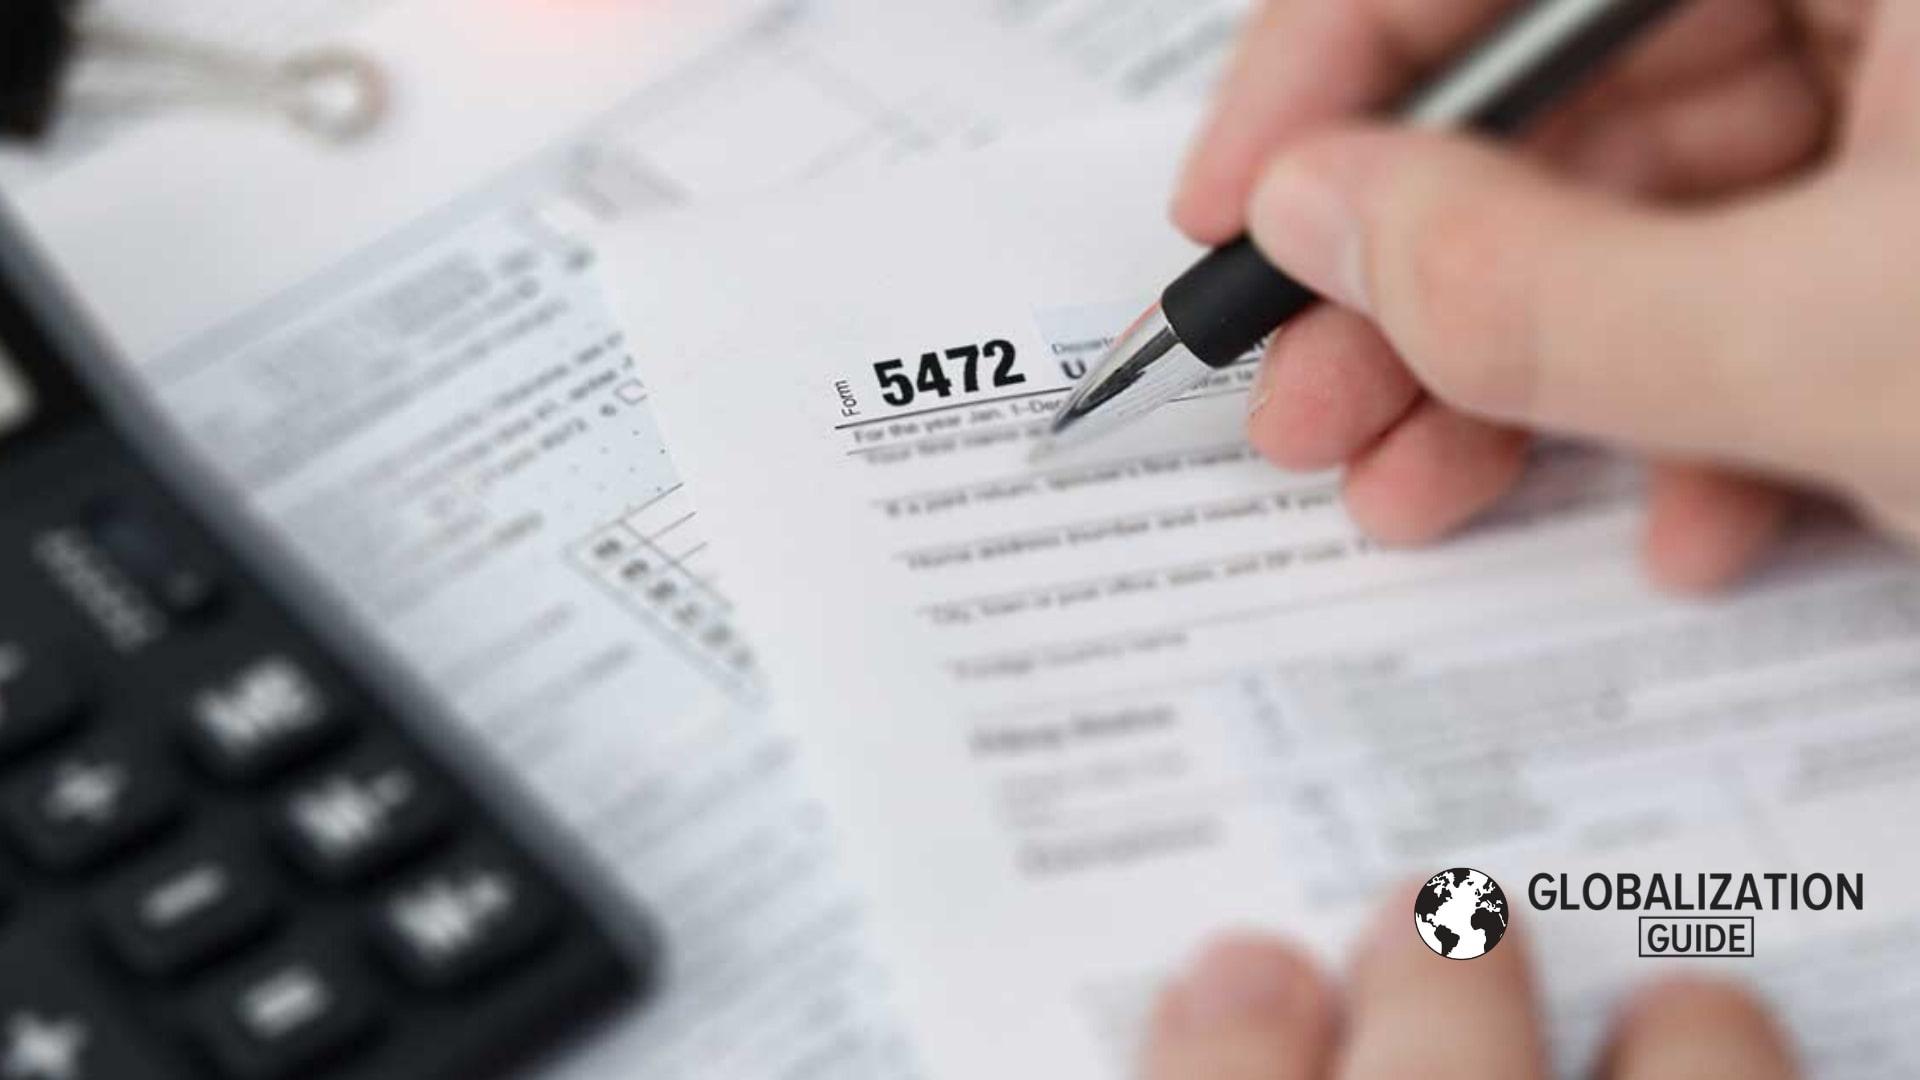 IRS form 5472 preparation